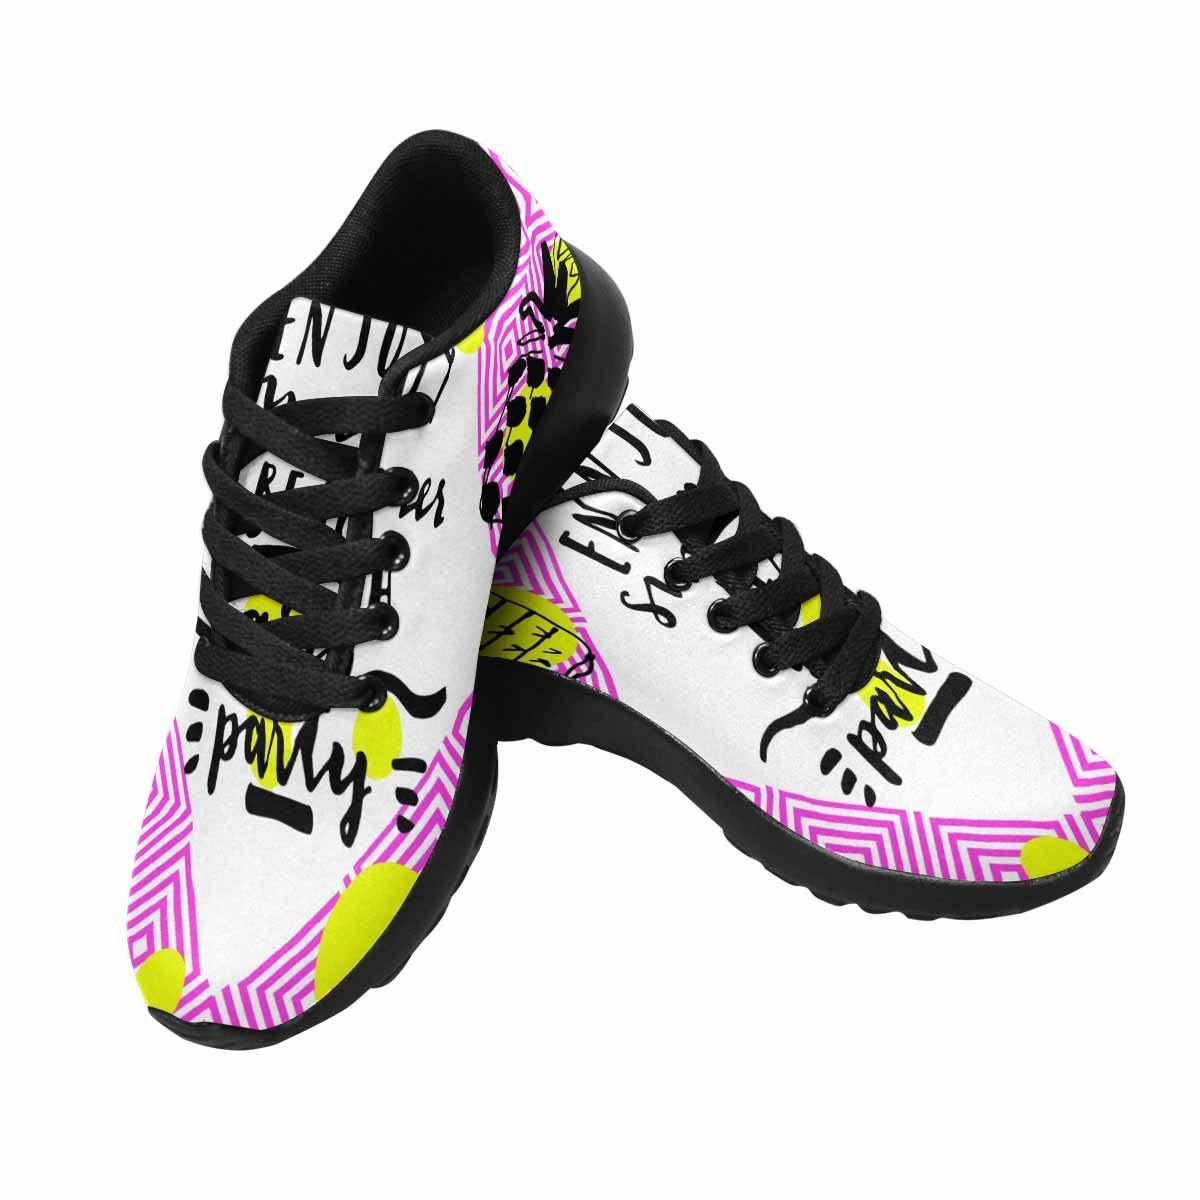 InterestPrint Women's Go Easy Walking Comfort Sports Athletic Shoes Enjoy Summer Beach Party 7 B(M) US